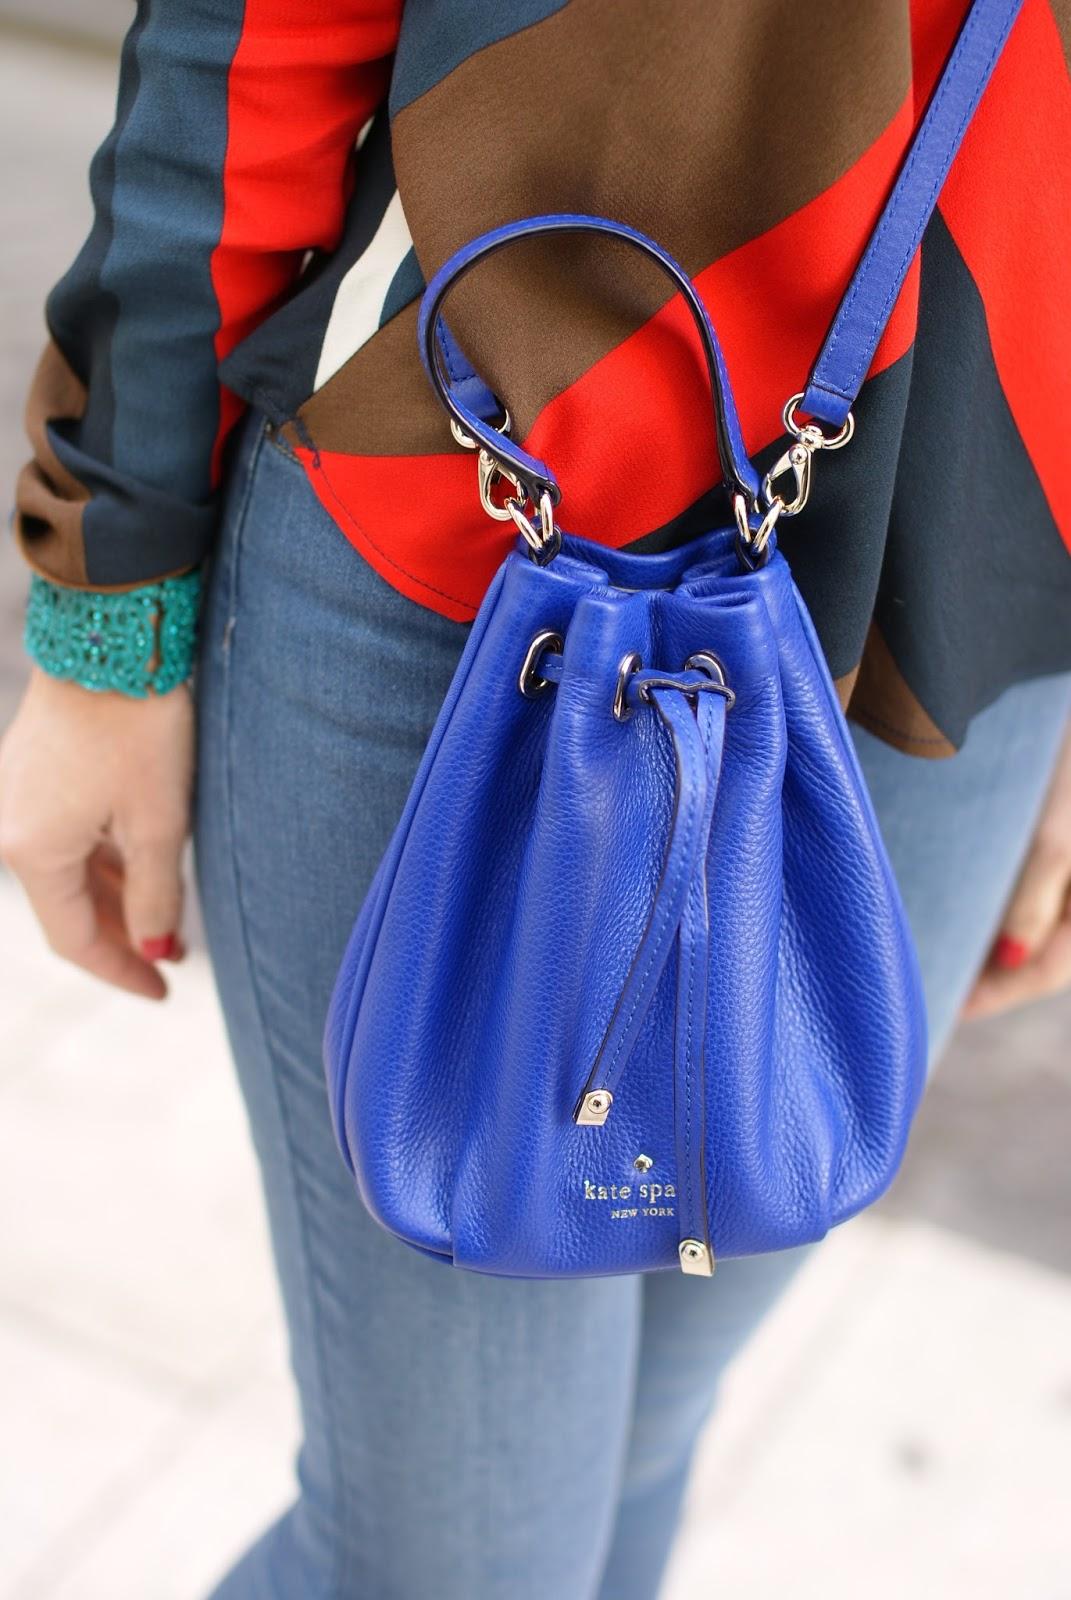 royal blue Kate Spade New York Wyatt mini bucket bag on Fashion and Cookies fashion blog, fashion blogger style